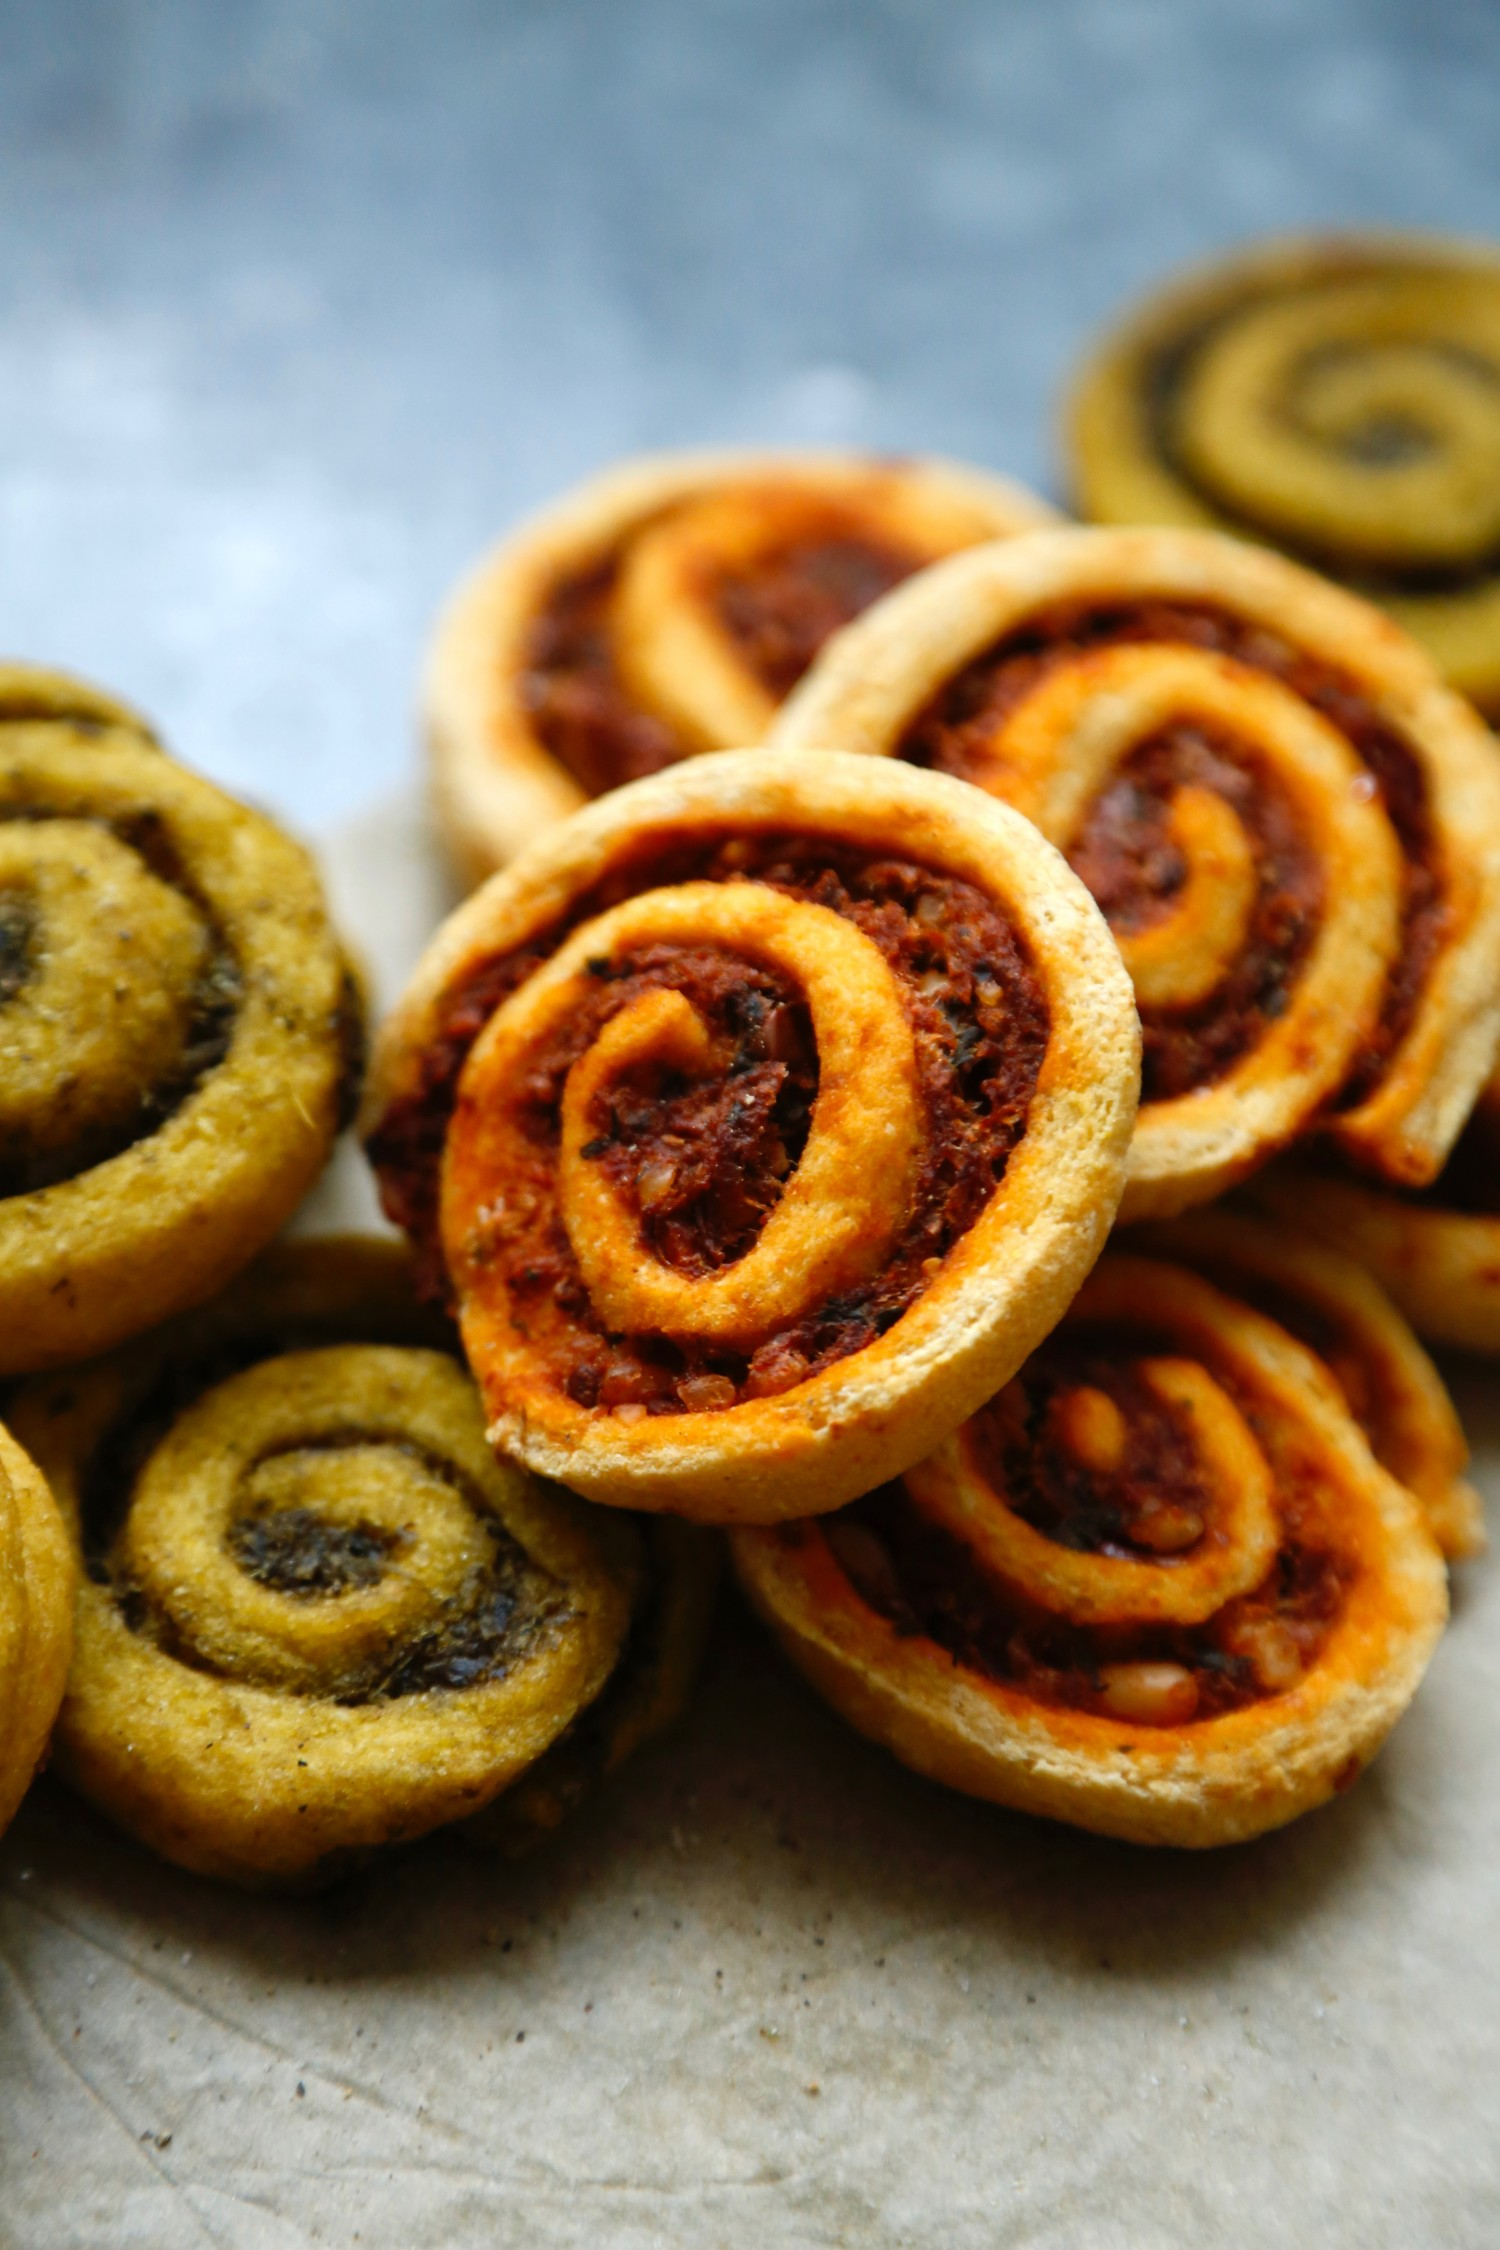 opskrift-glutenfri-pestosnegle-ide-til-sund-madpakke-3